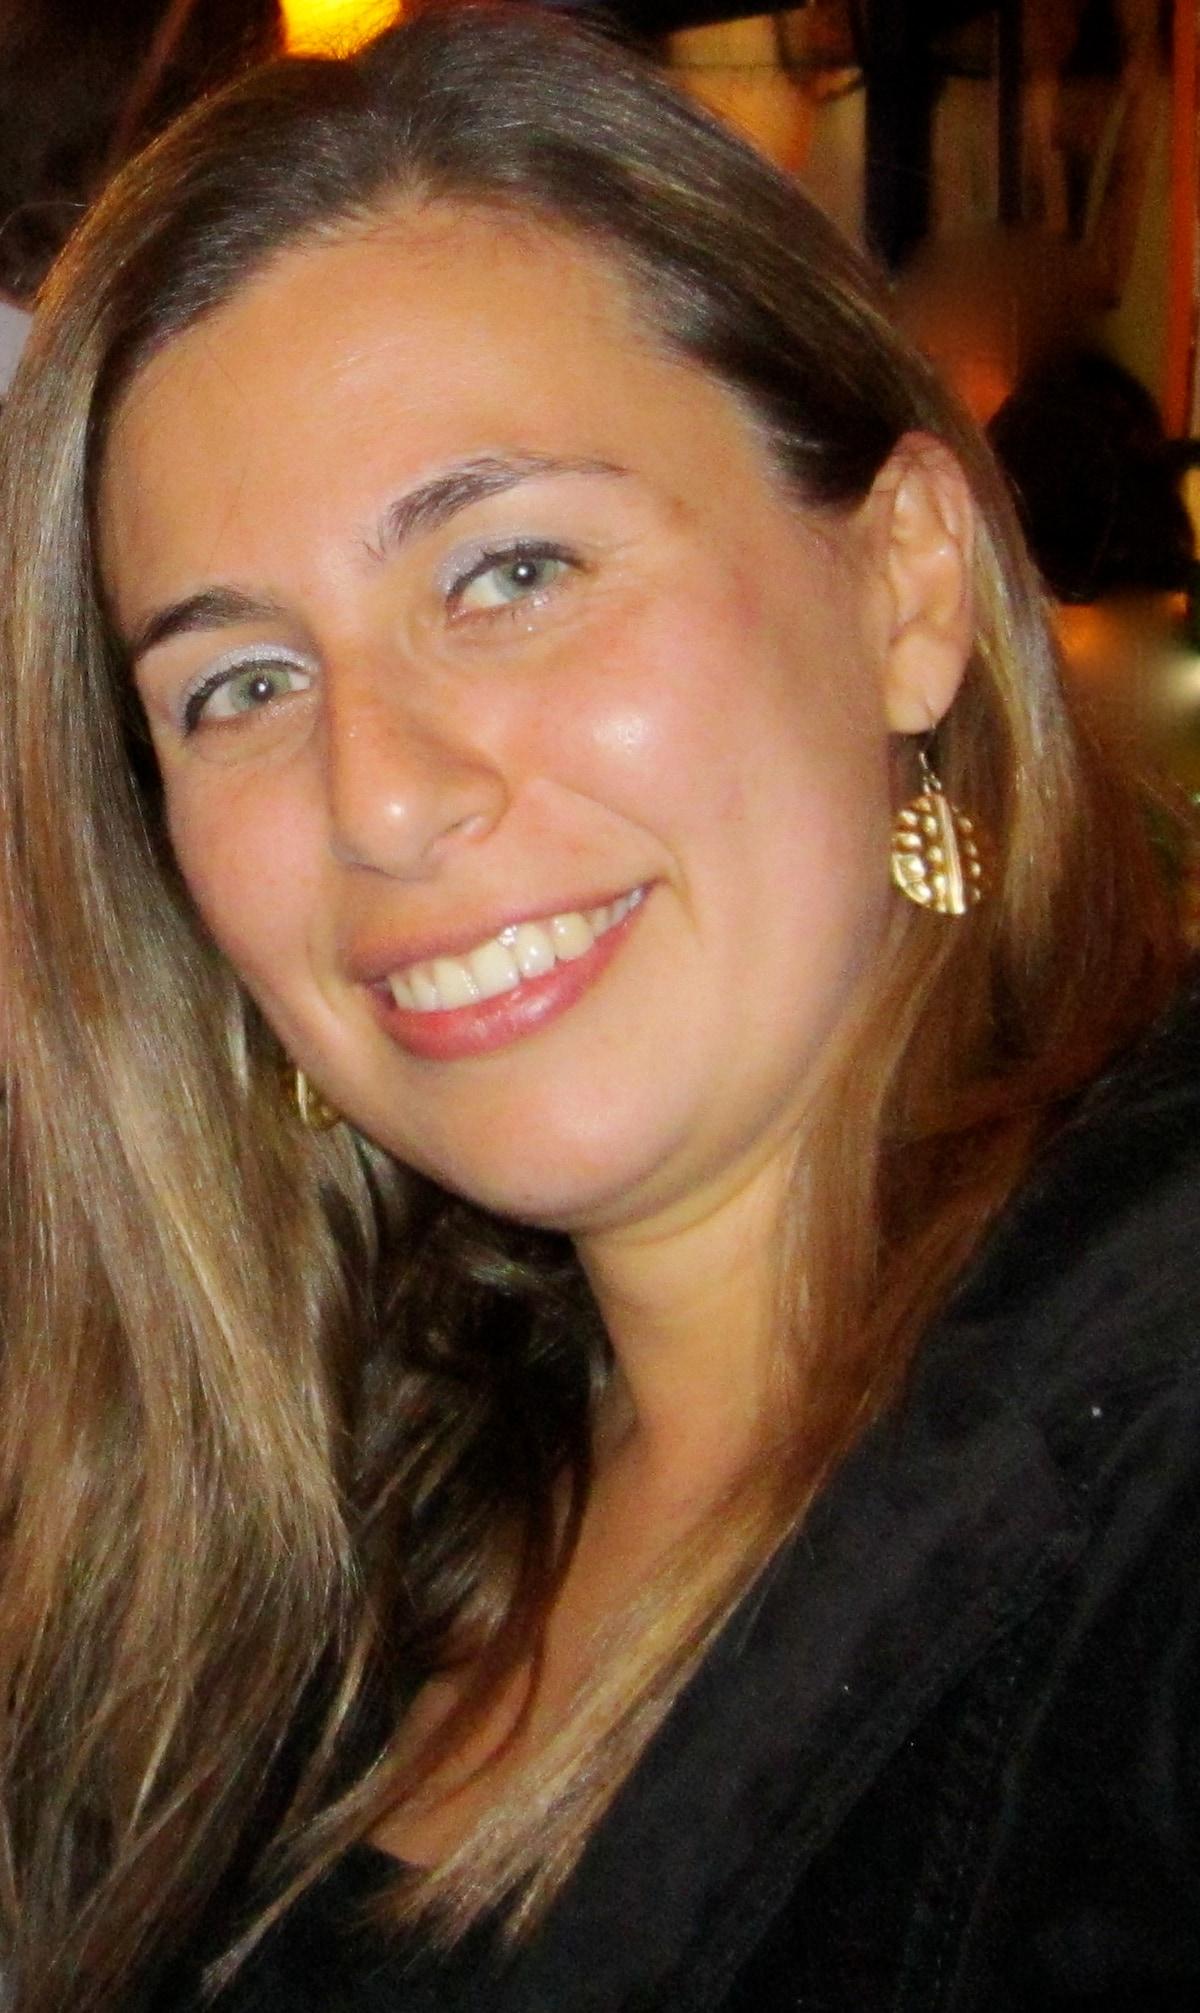 Carmela From Washington, DC